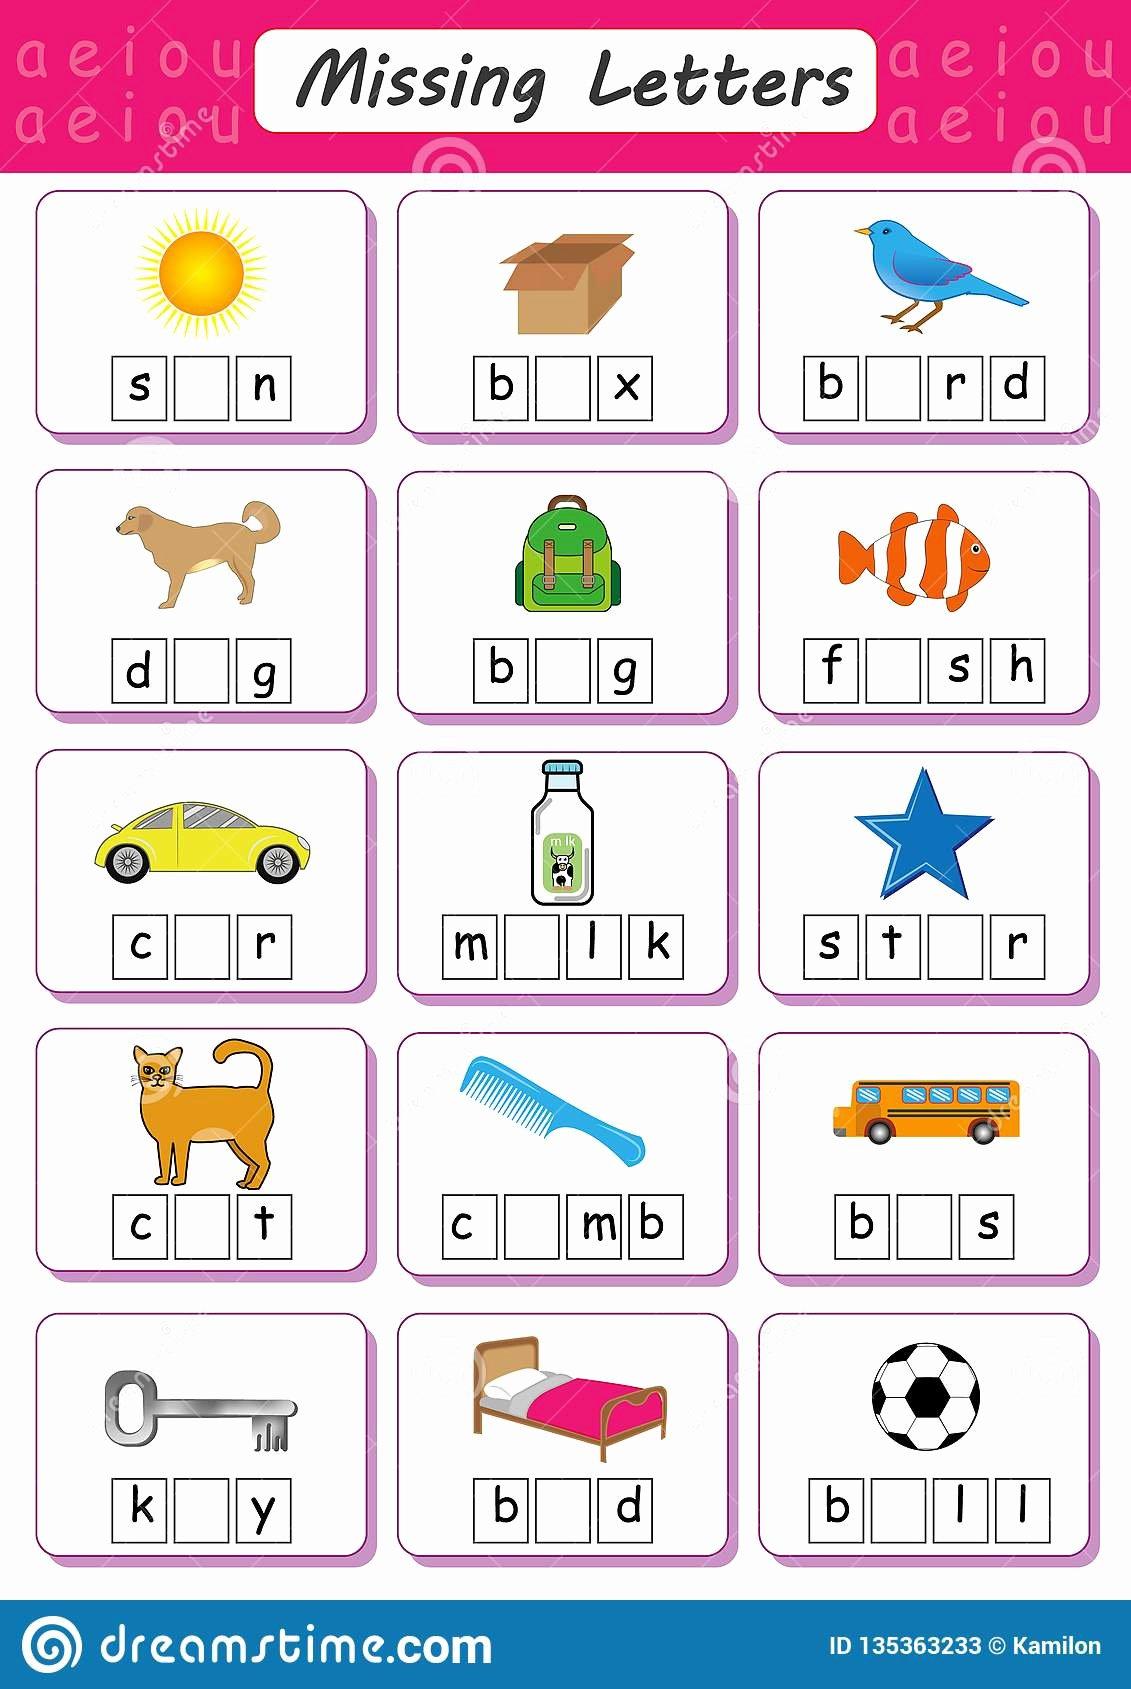 Missing Letters Worksheet for Kindergarten Kids Write Missing Letter Write the Missing Vowel Worksheet for